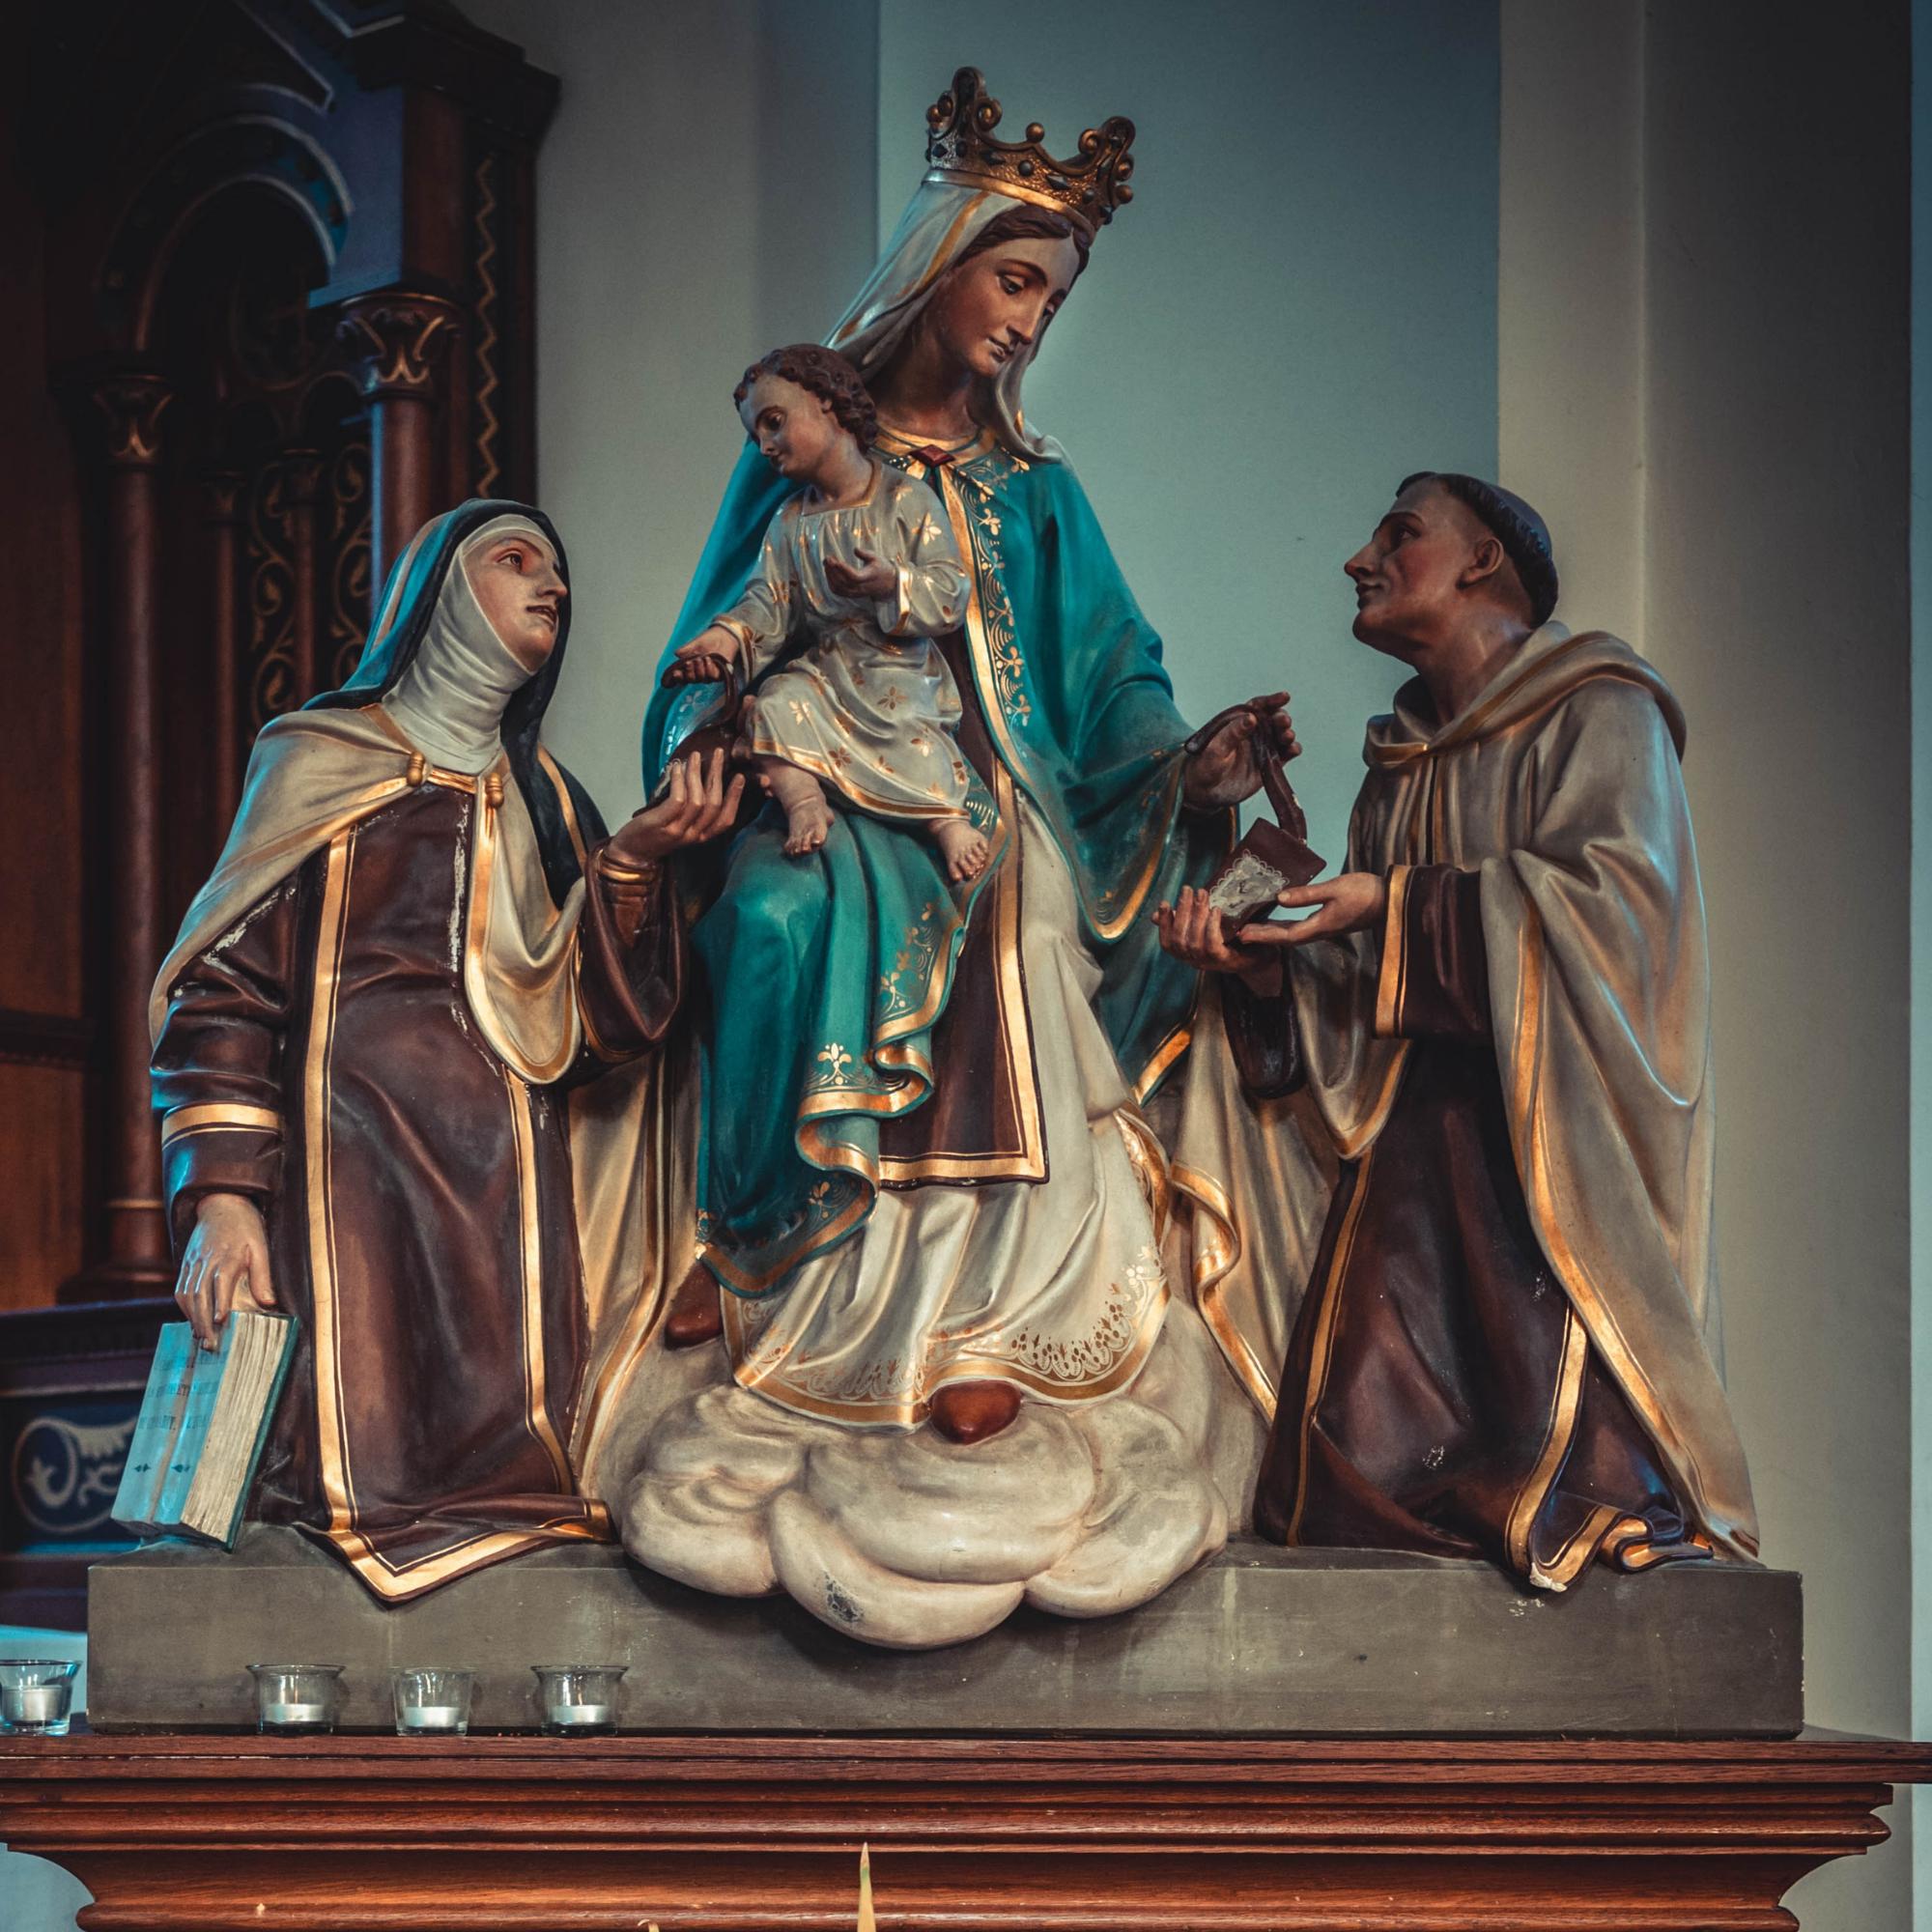 Why Do Catholics Pray to the Saints?